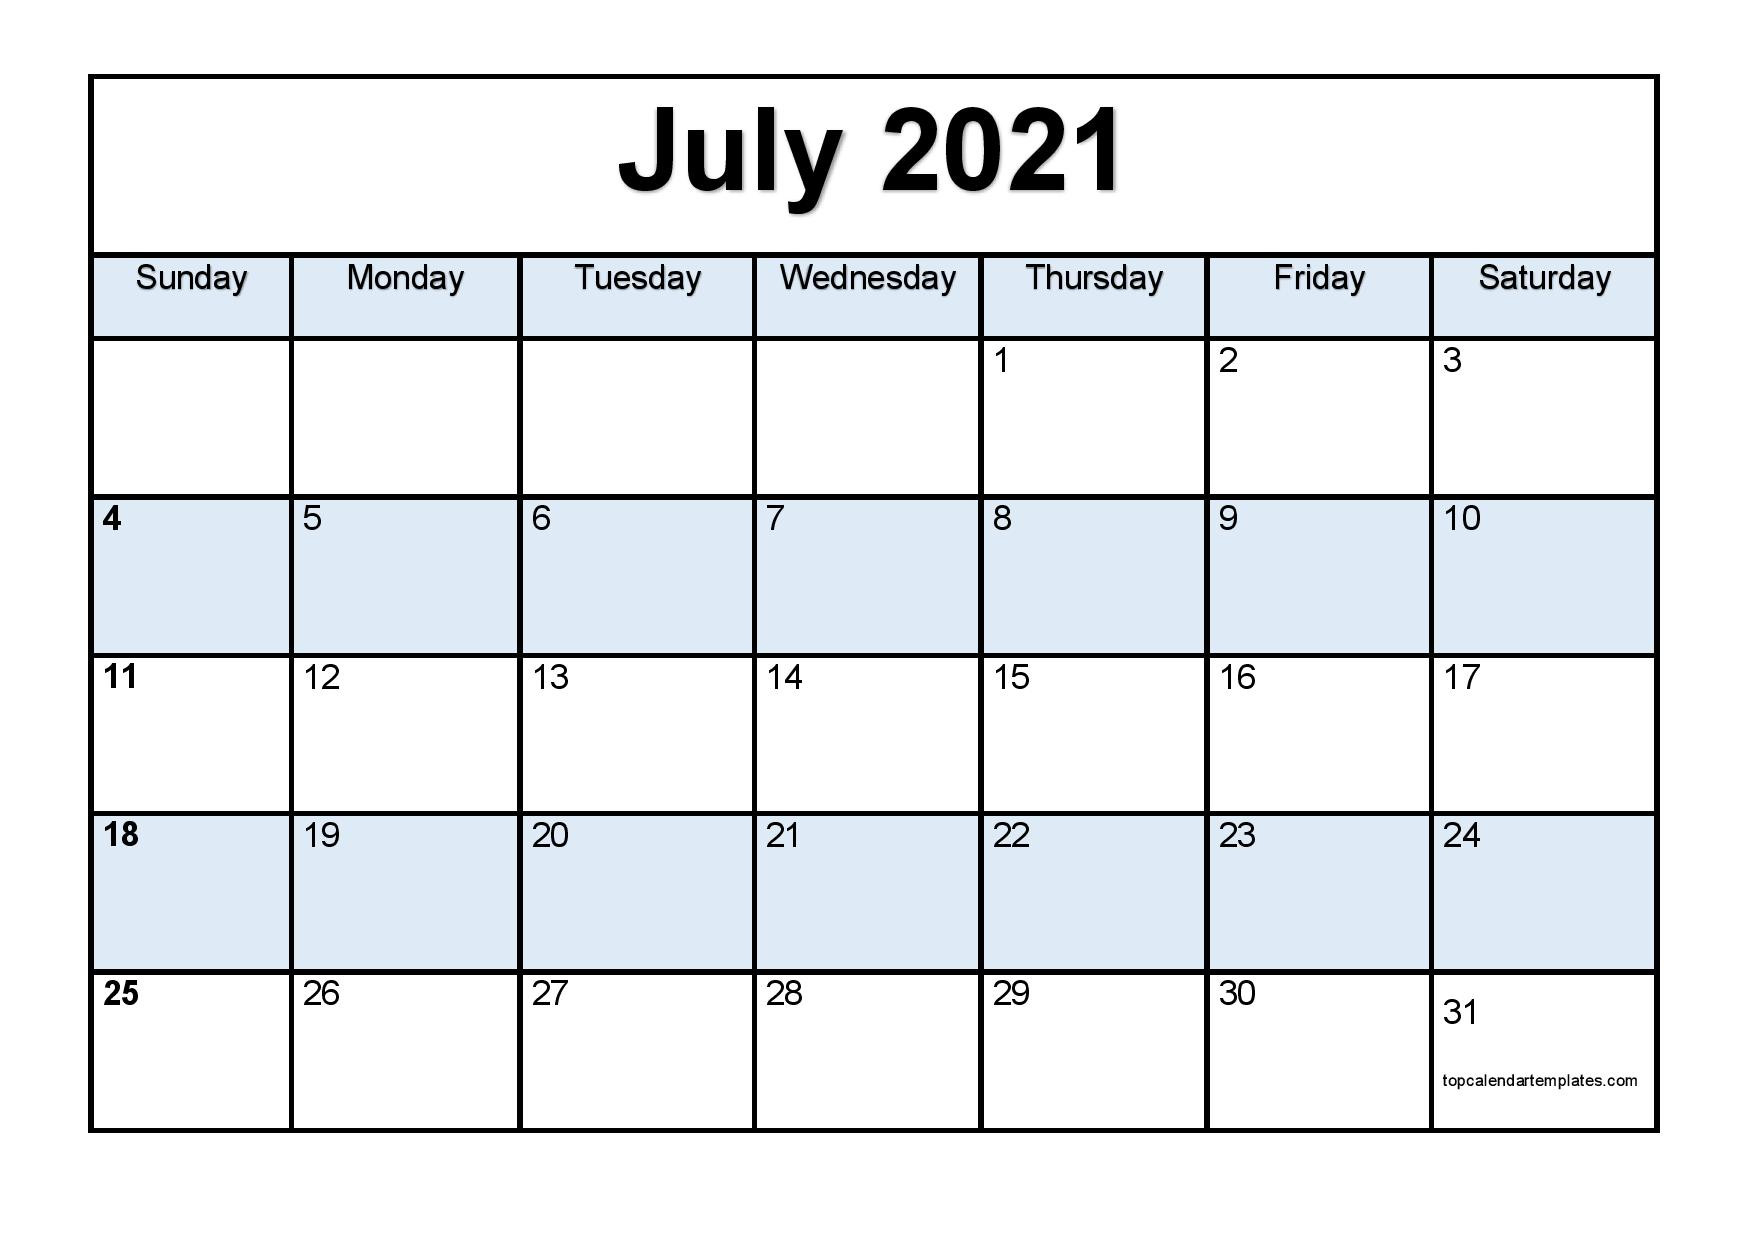 Printable July 2021 Calendar Template - Pdf, Word, Excel  Depoprecara Calendar  July 2021